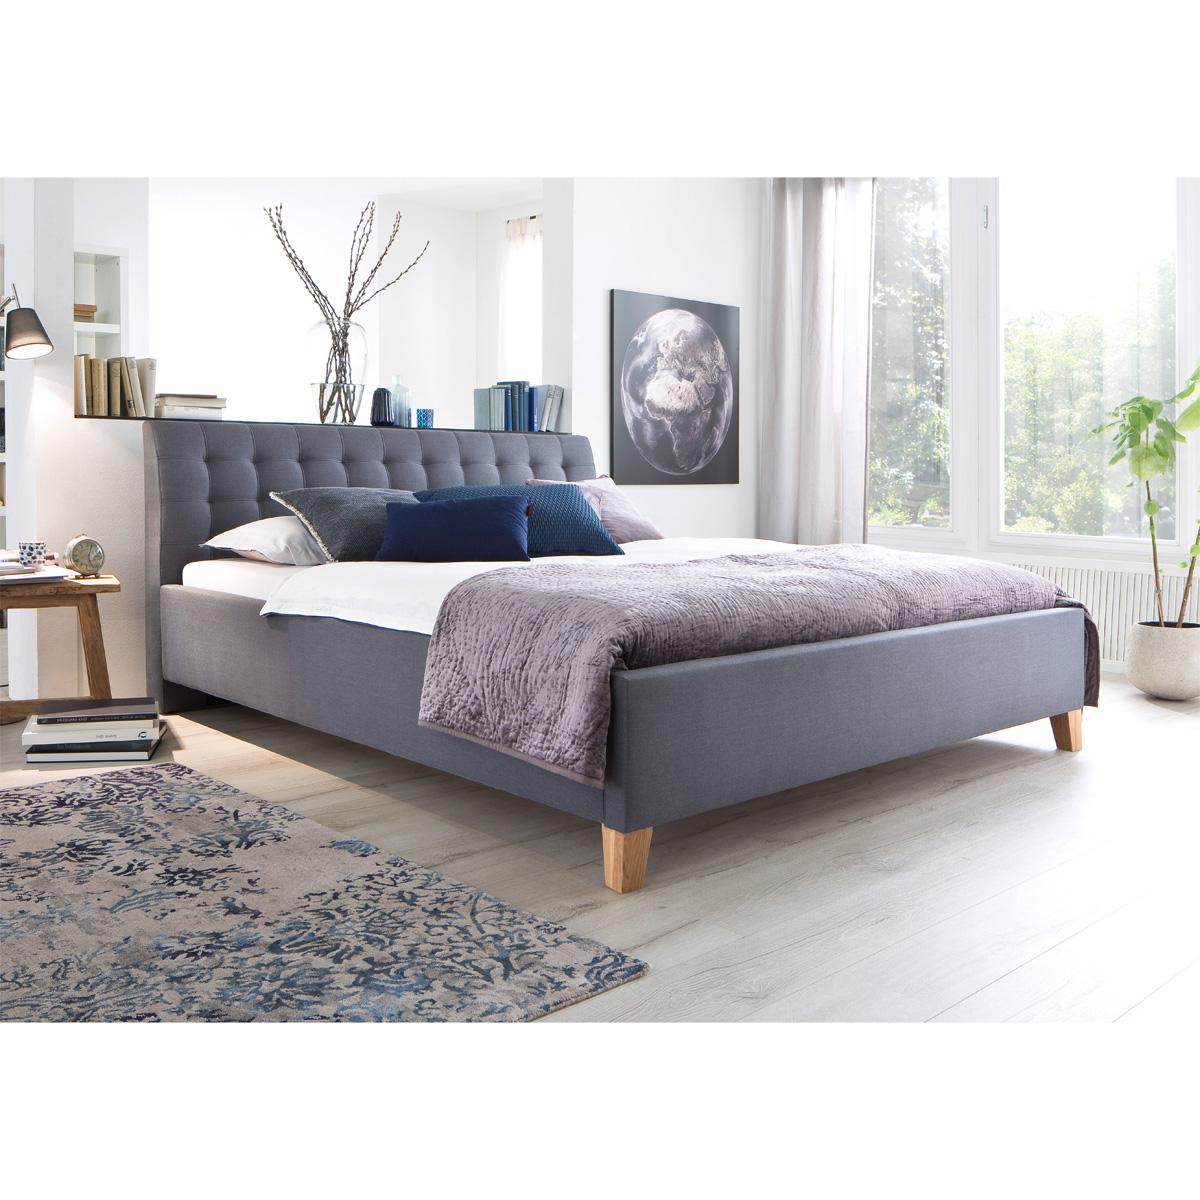 bett 180 cm top betten frisch bett x cm wei led licht streifen mit matratze amp with bett 180. Black Bedroom Furniture Sets. Home Design Ideas